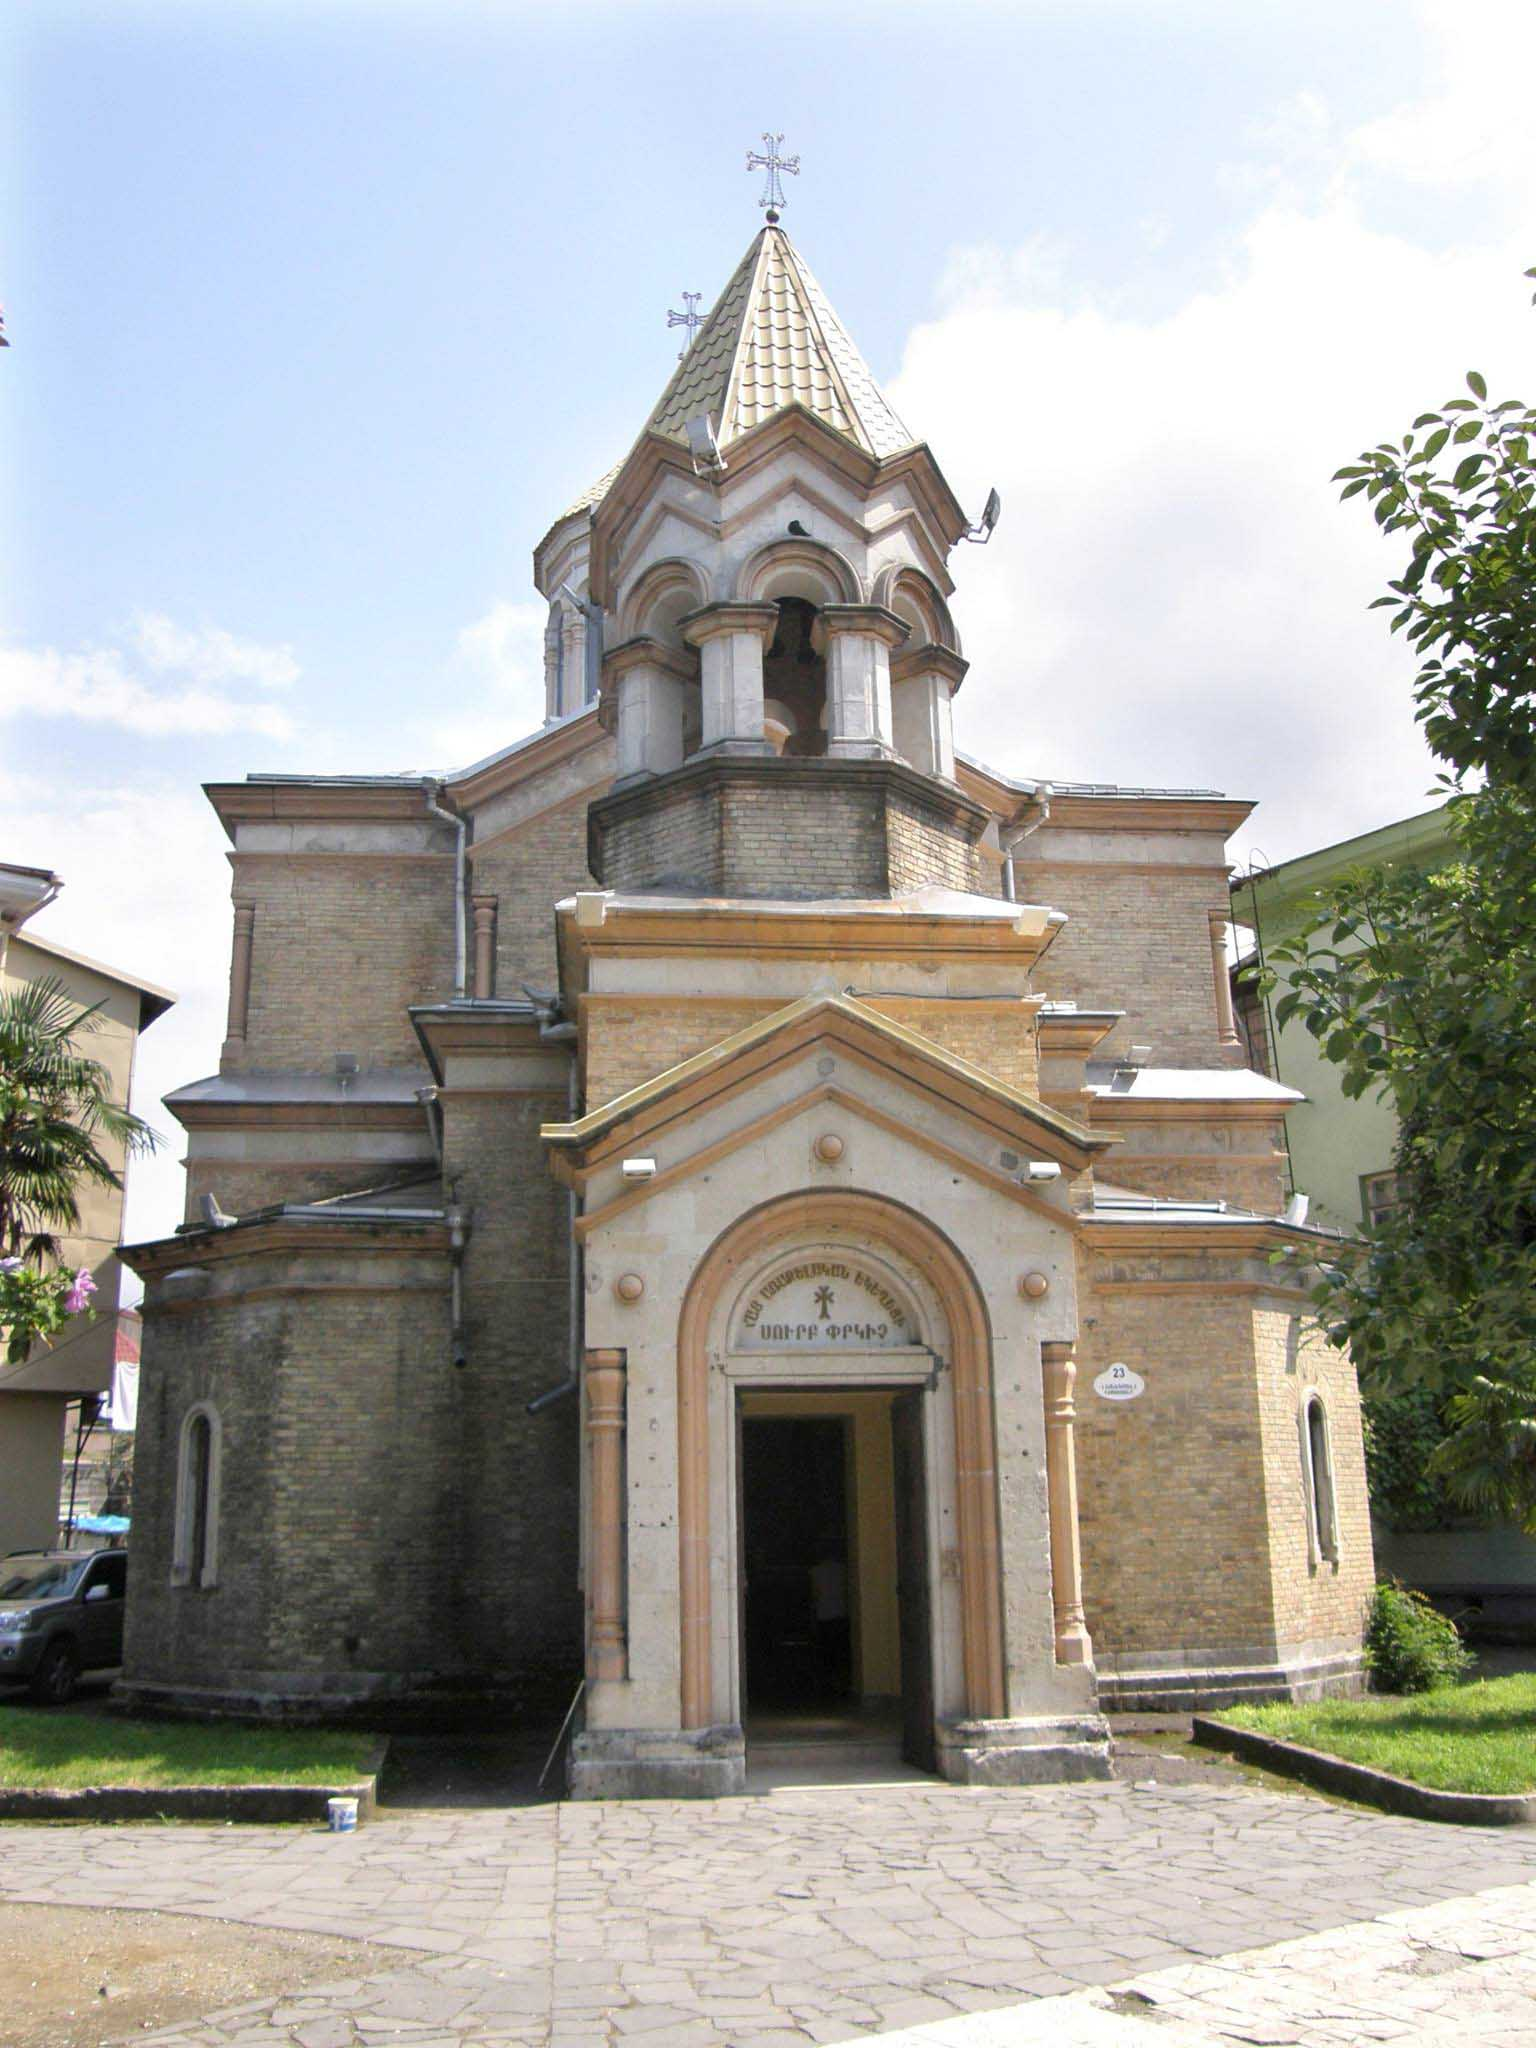 https://armenianchurch.ge/images/stories/ekegheciner/Batumi/surb_phrkich/q._batumi_surb_prkich_3.jpg